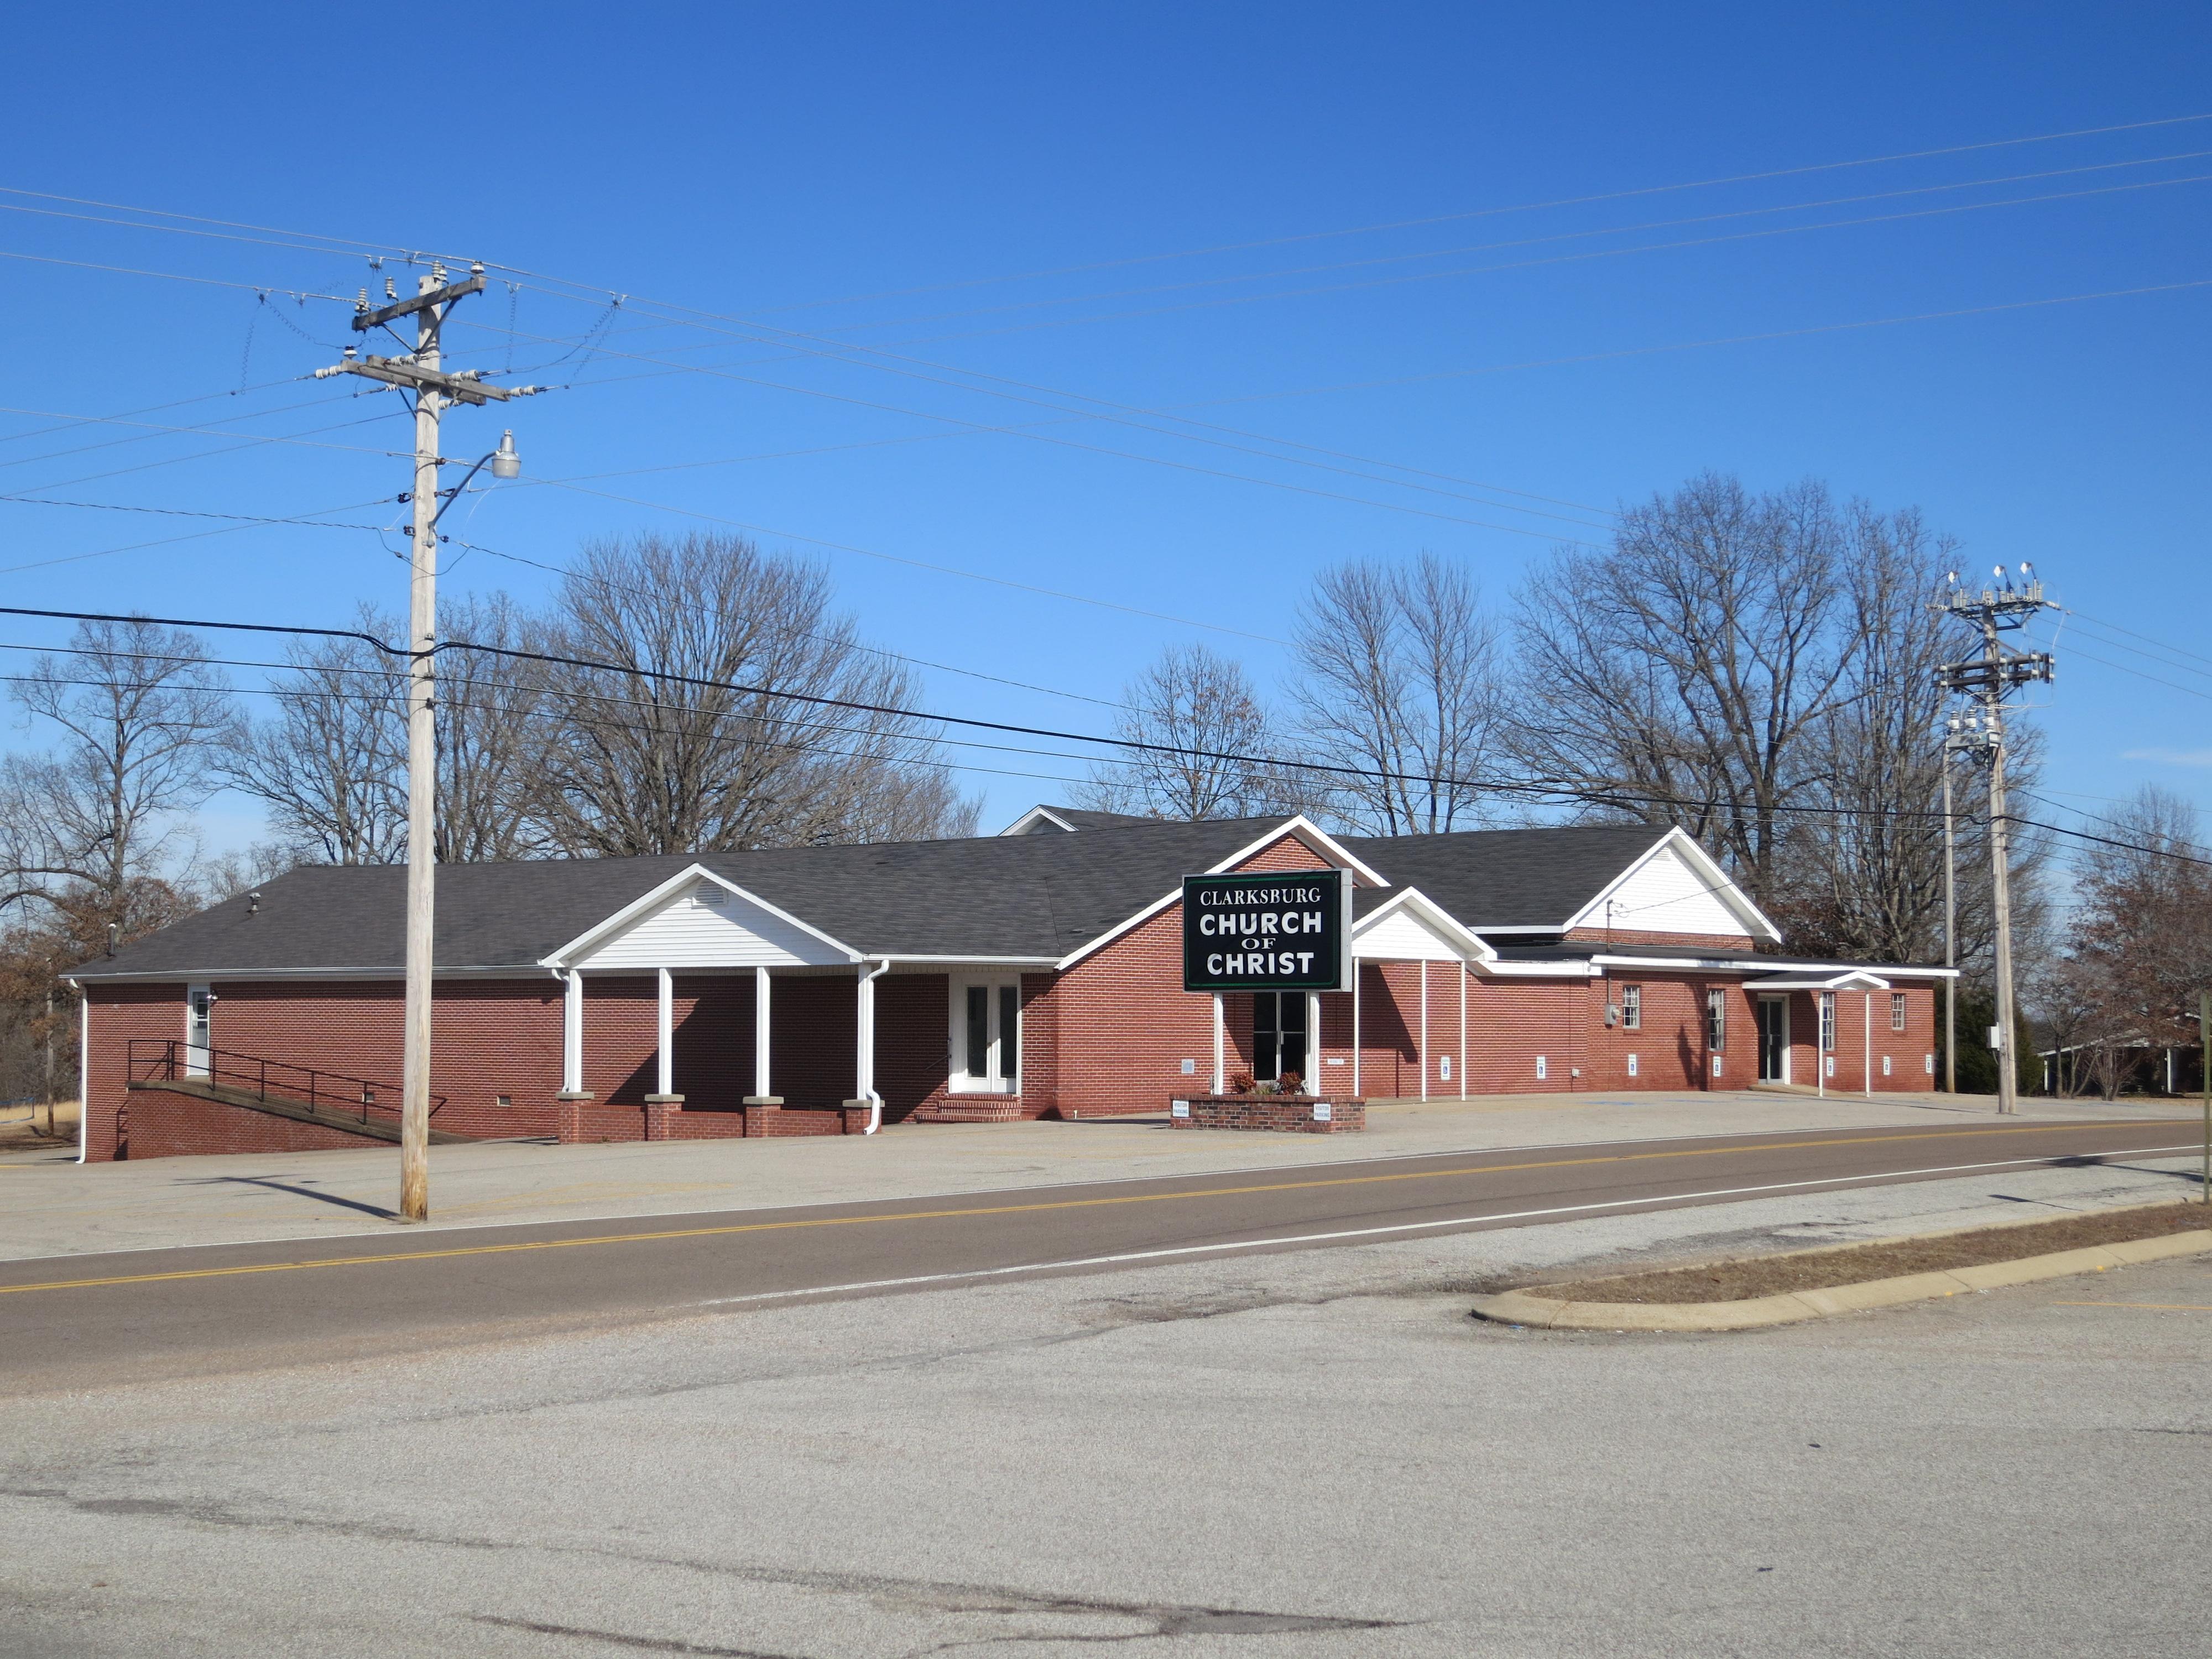 Tennessee carroll county clarksburg - Clarksburg_c_of_c Jpg Clarksburg Church Of Christ